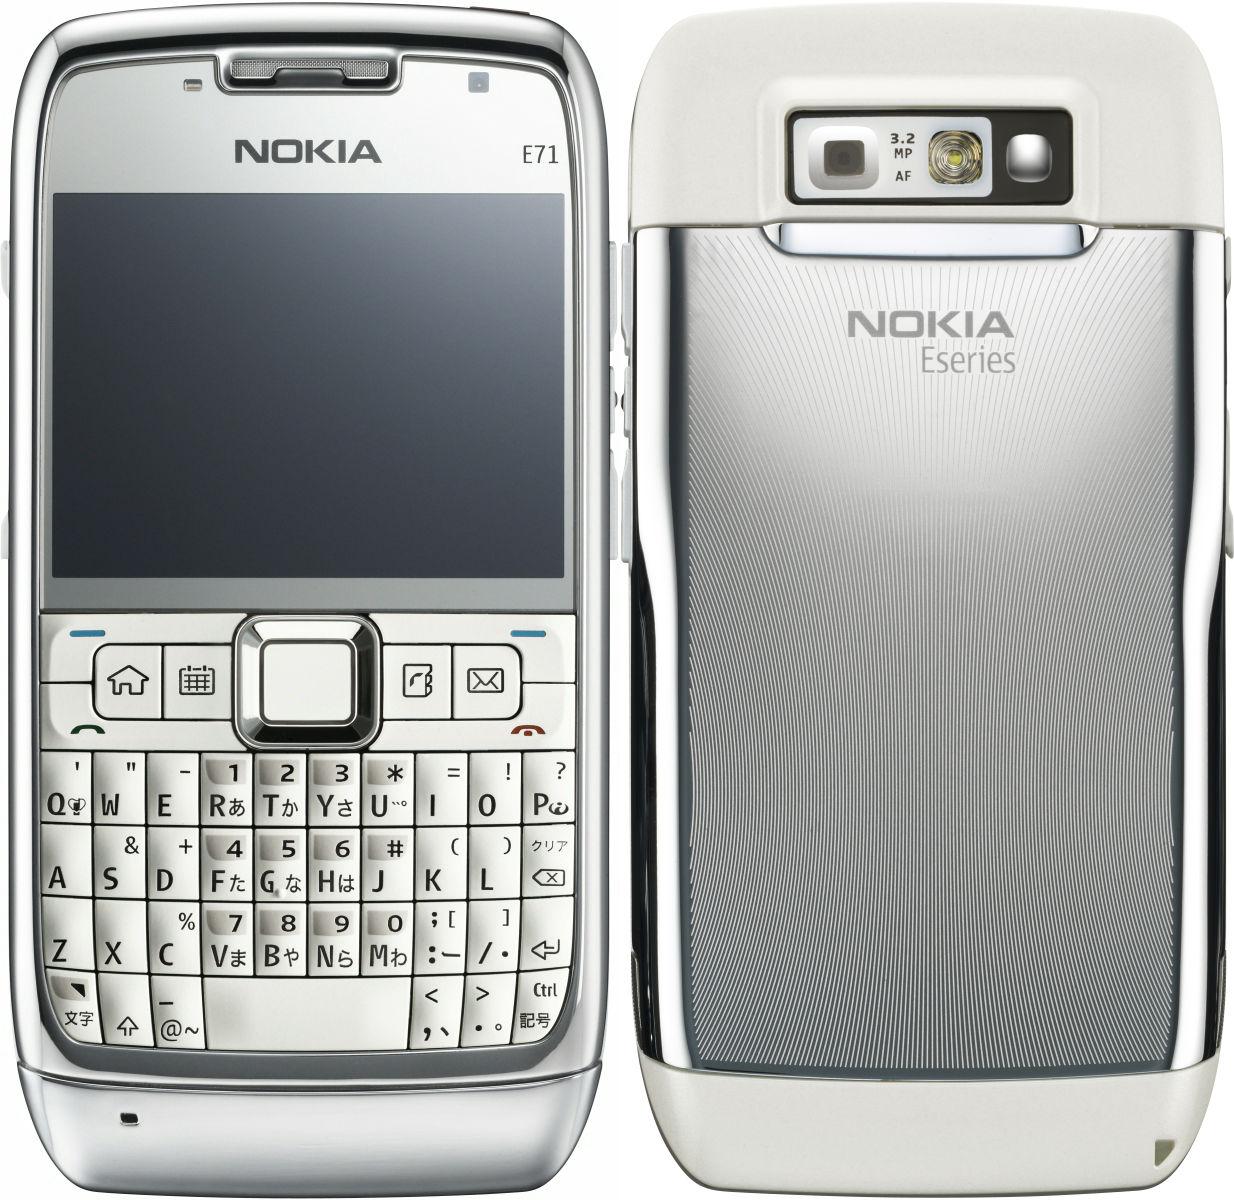 http://1.bp.blogspot.com/-CcZlBk9_vss/TdZwfdzAwXI/AAAAAAAADxU/nlHrIpygmDk/s1600/Nokia%20E71%20white%20by%20mobile%20mania%20(2).jpg